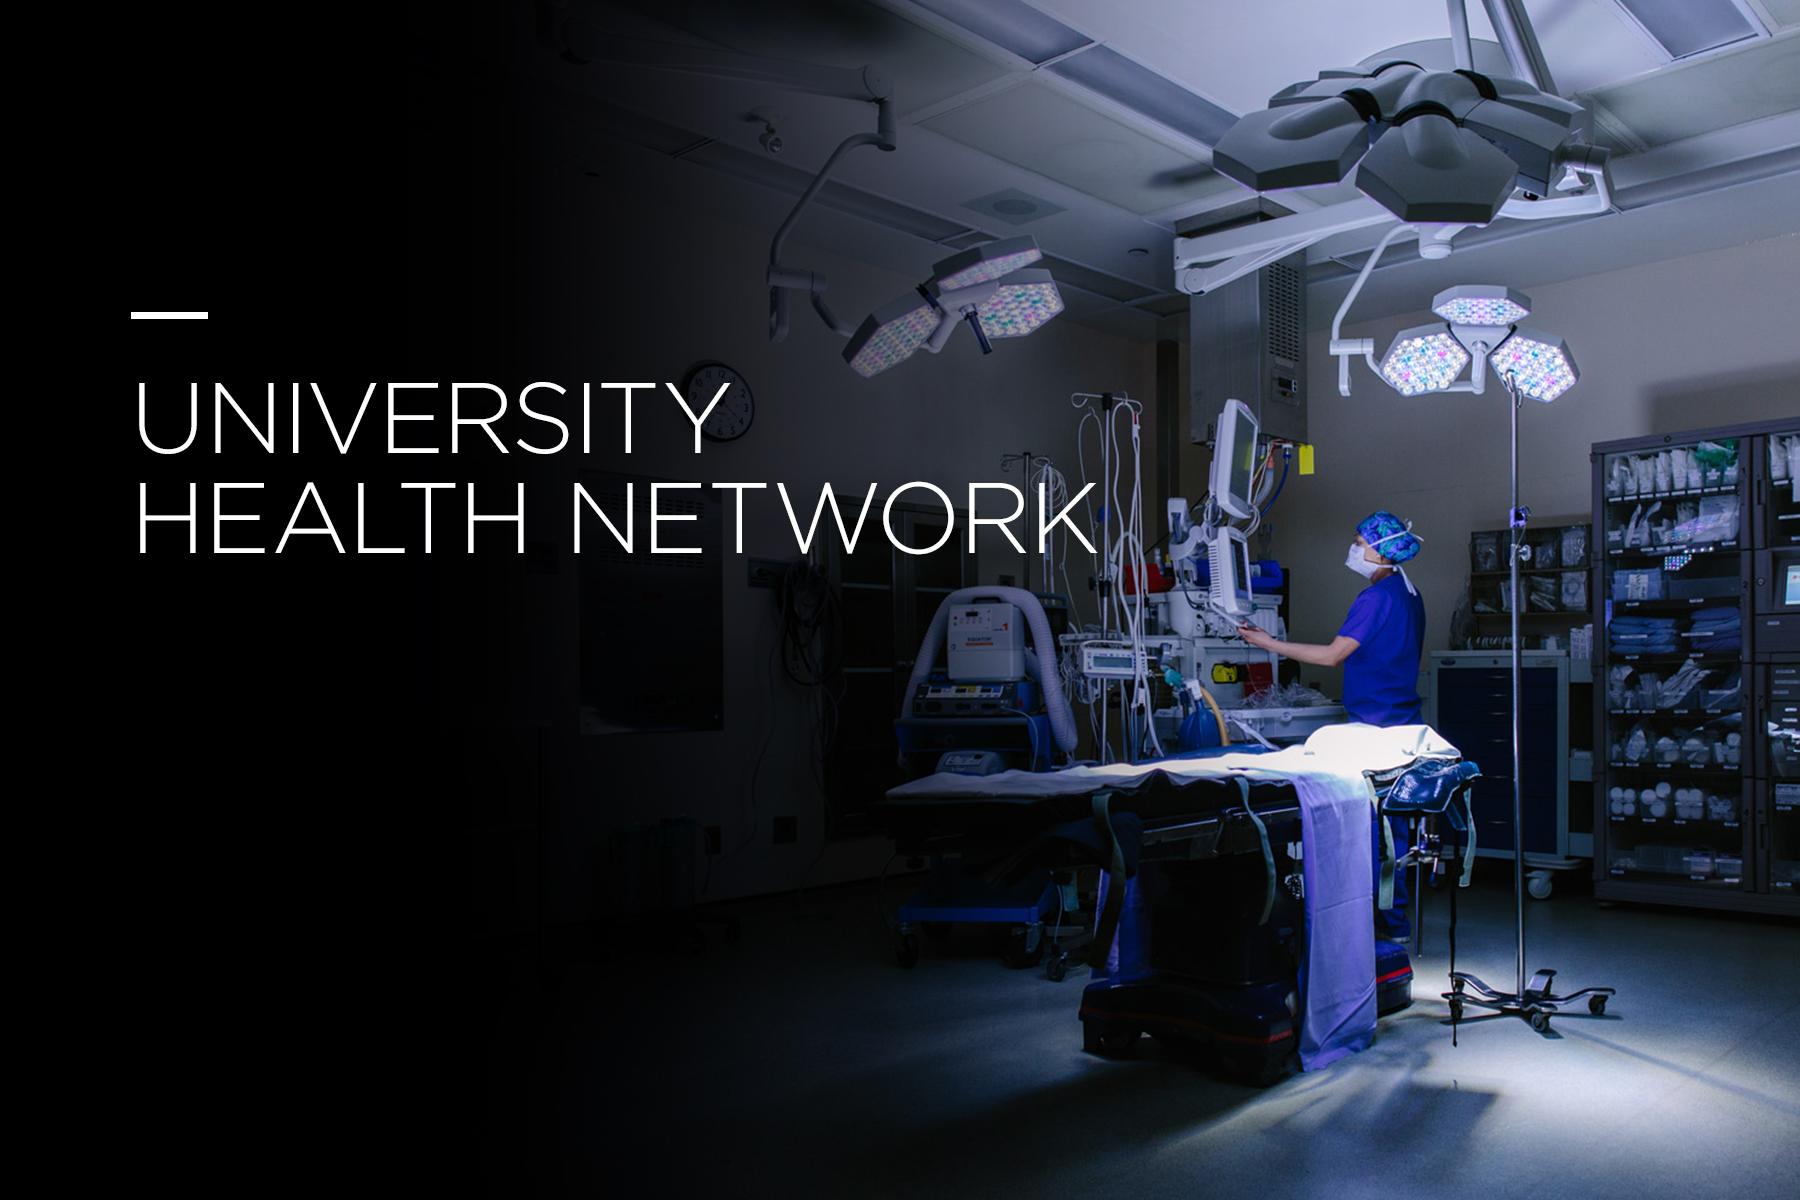 University Health Network